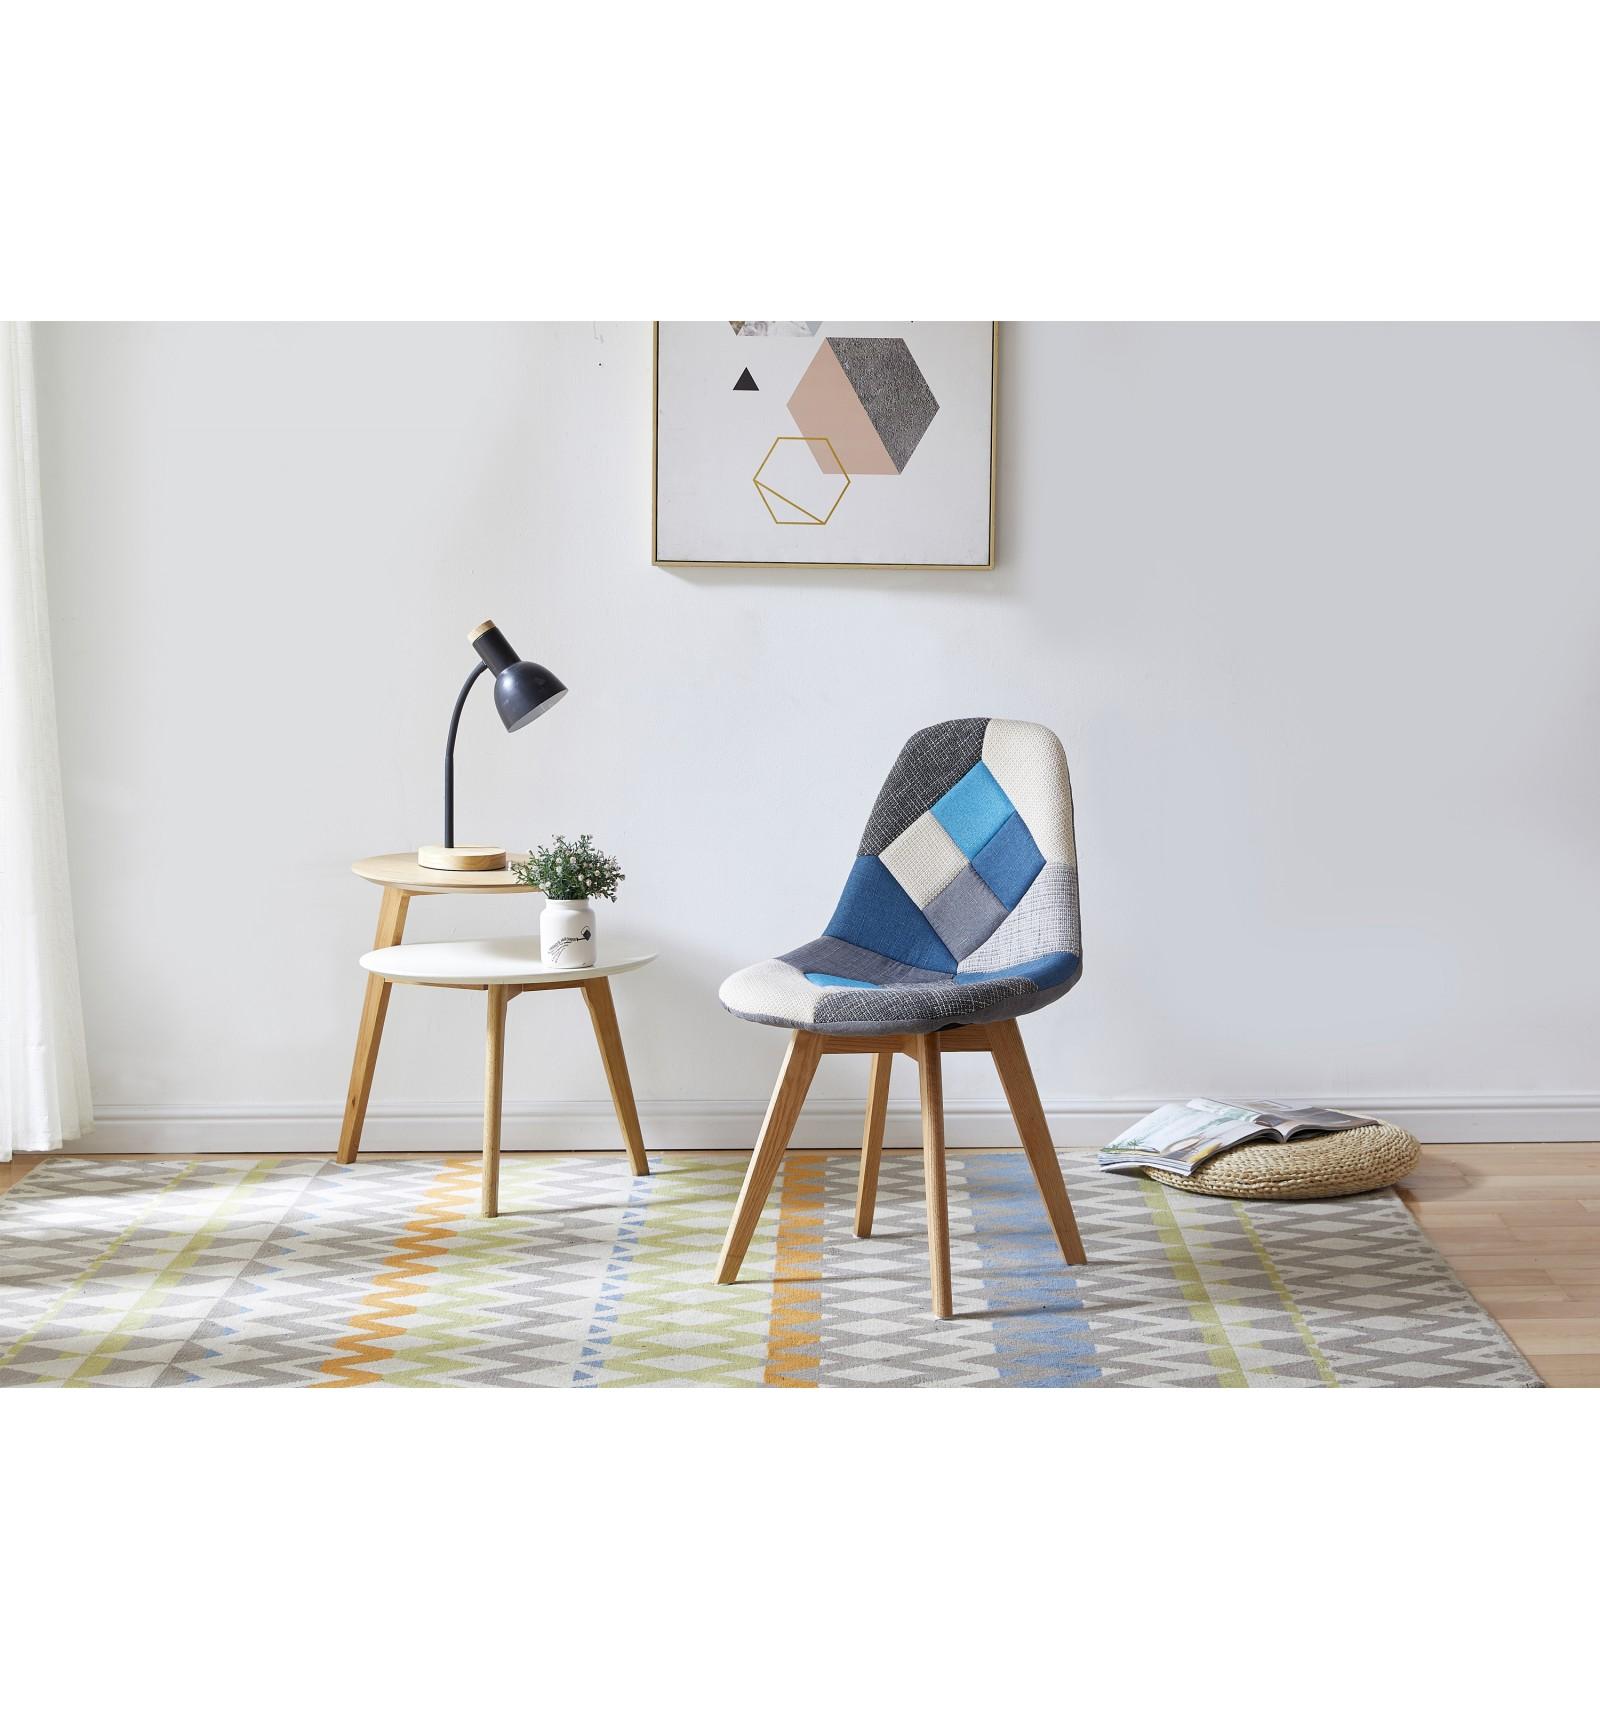 chaise scandinave patchwork bleu gris